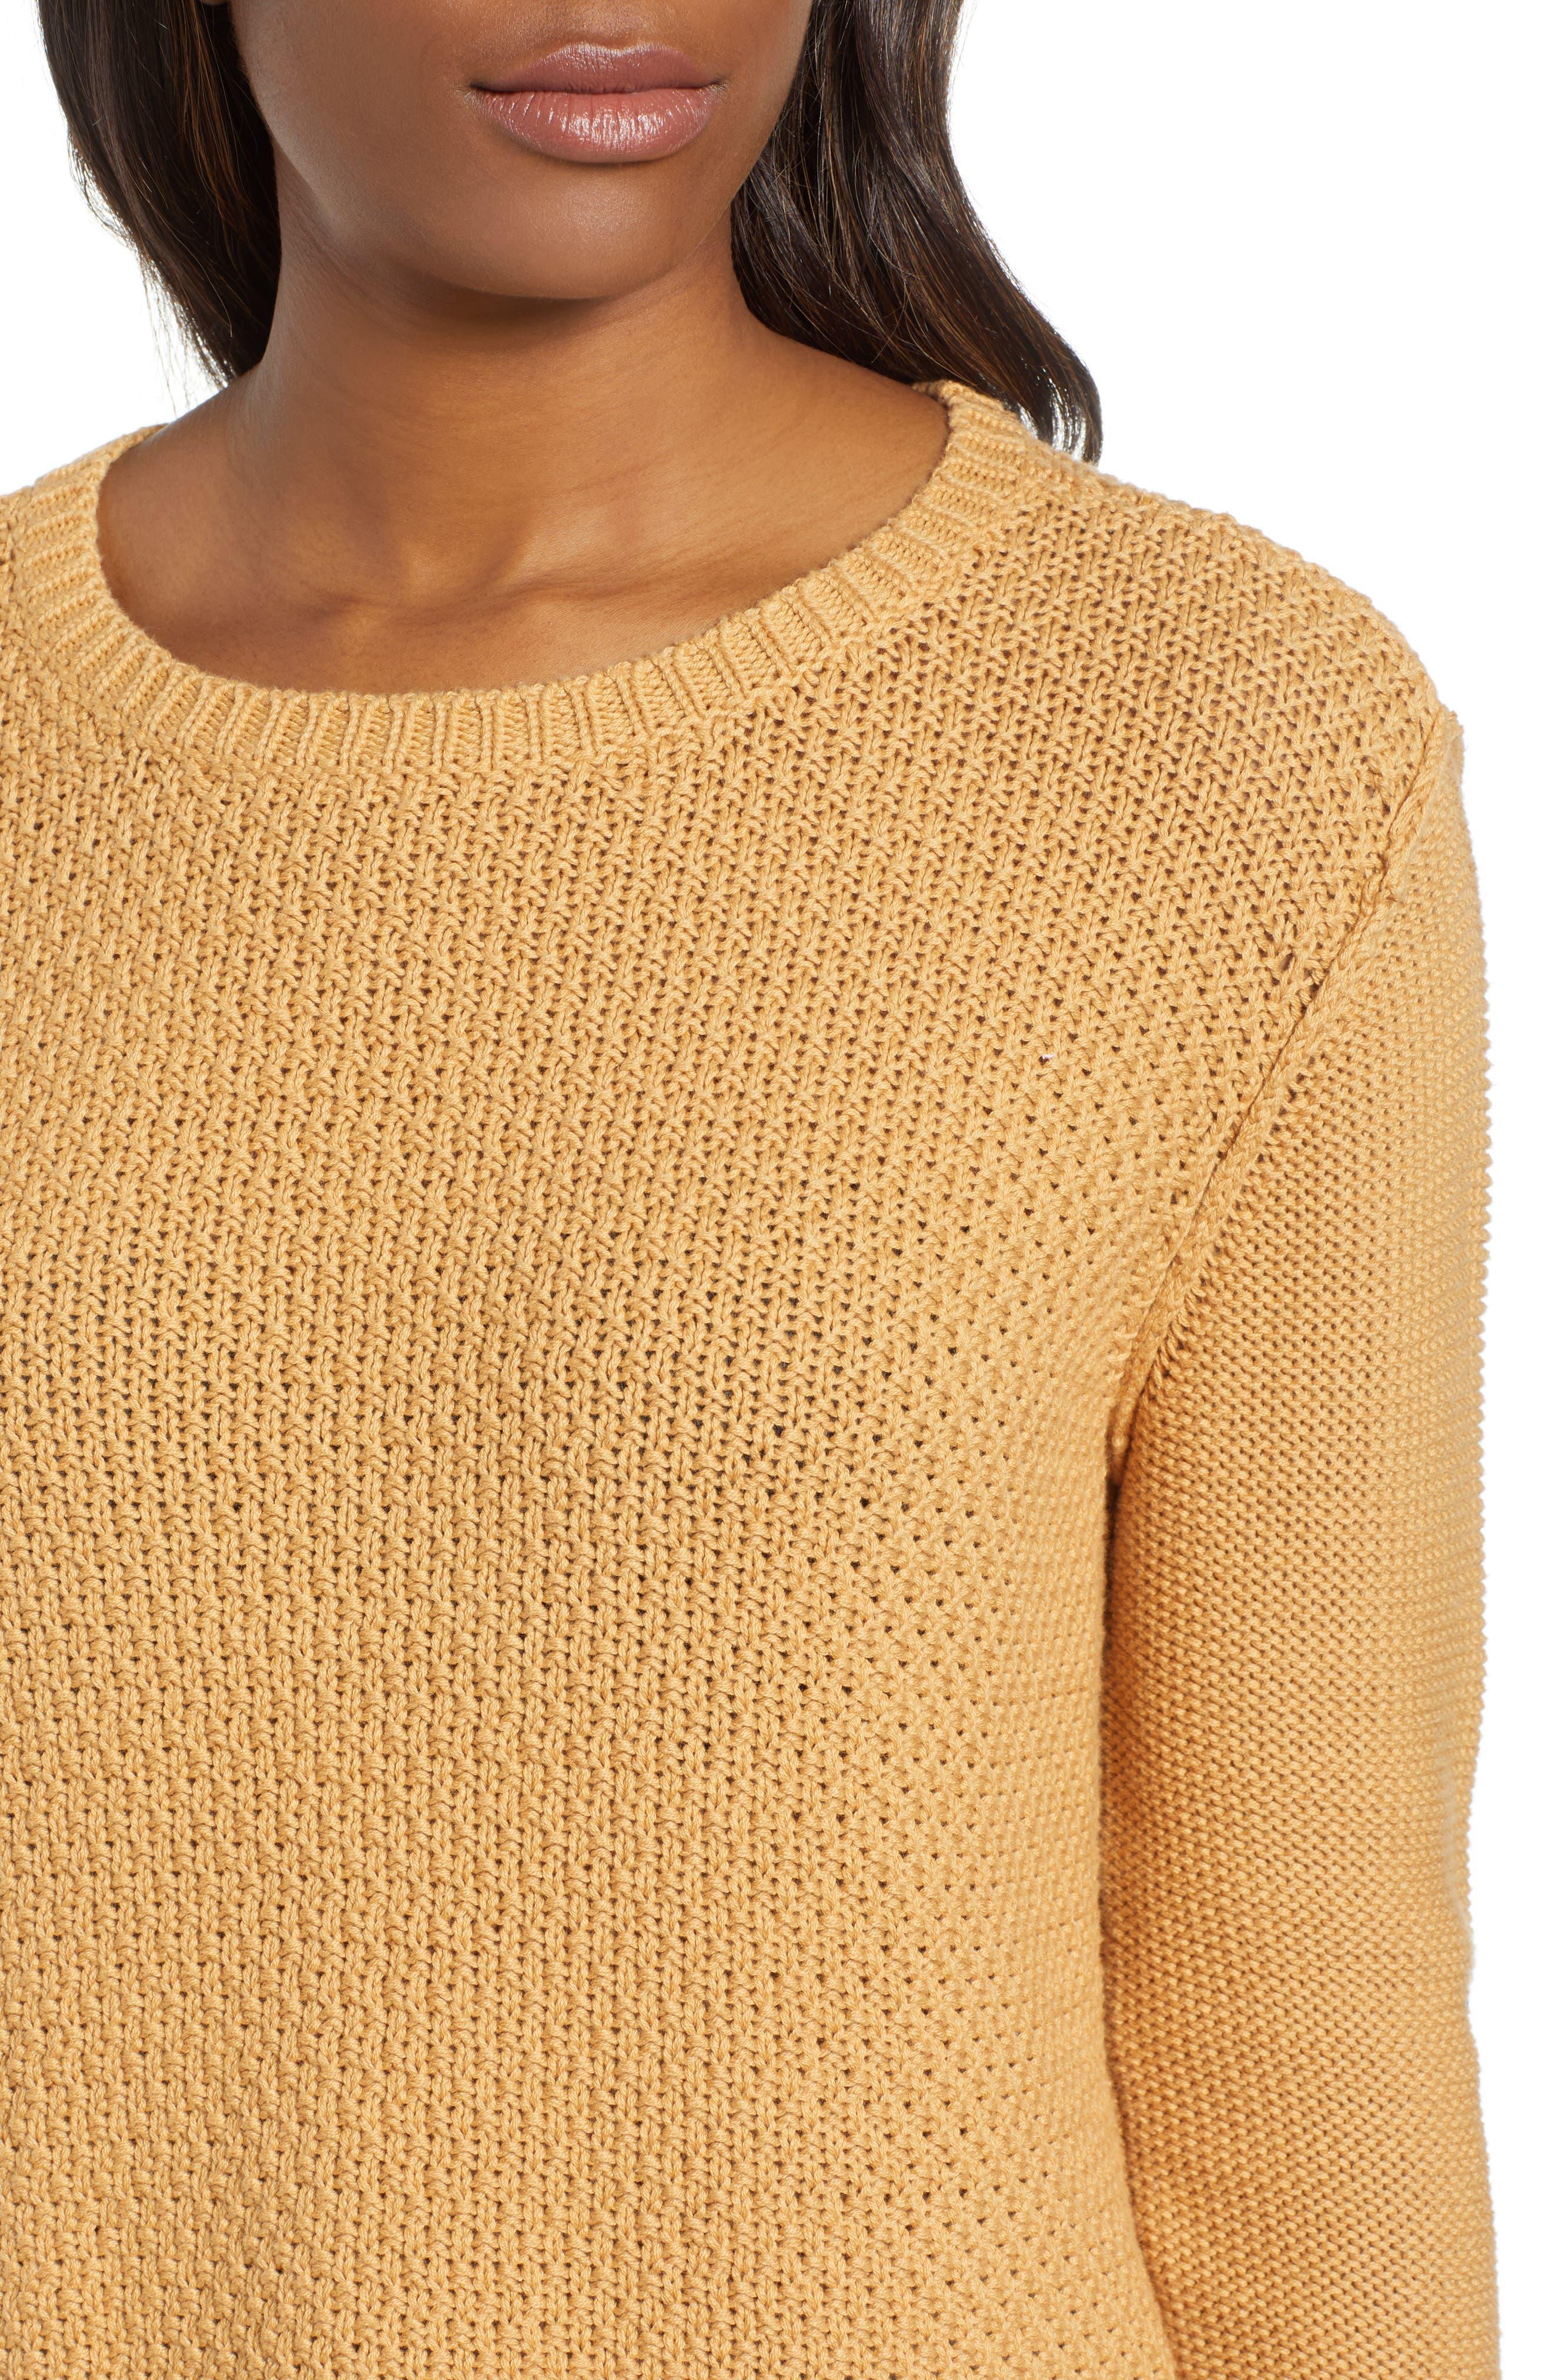 CASLON<SUP>®</SUP>, Mixed Stitch Sweater, Alternate thumbnail 4, color, TAN CINNAMON